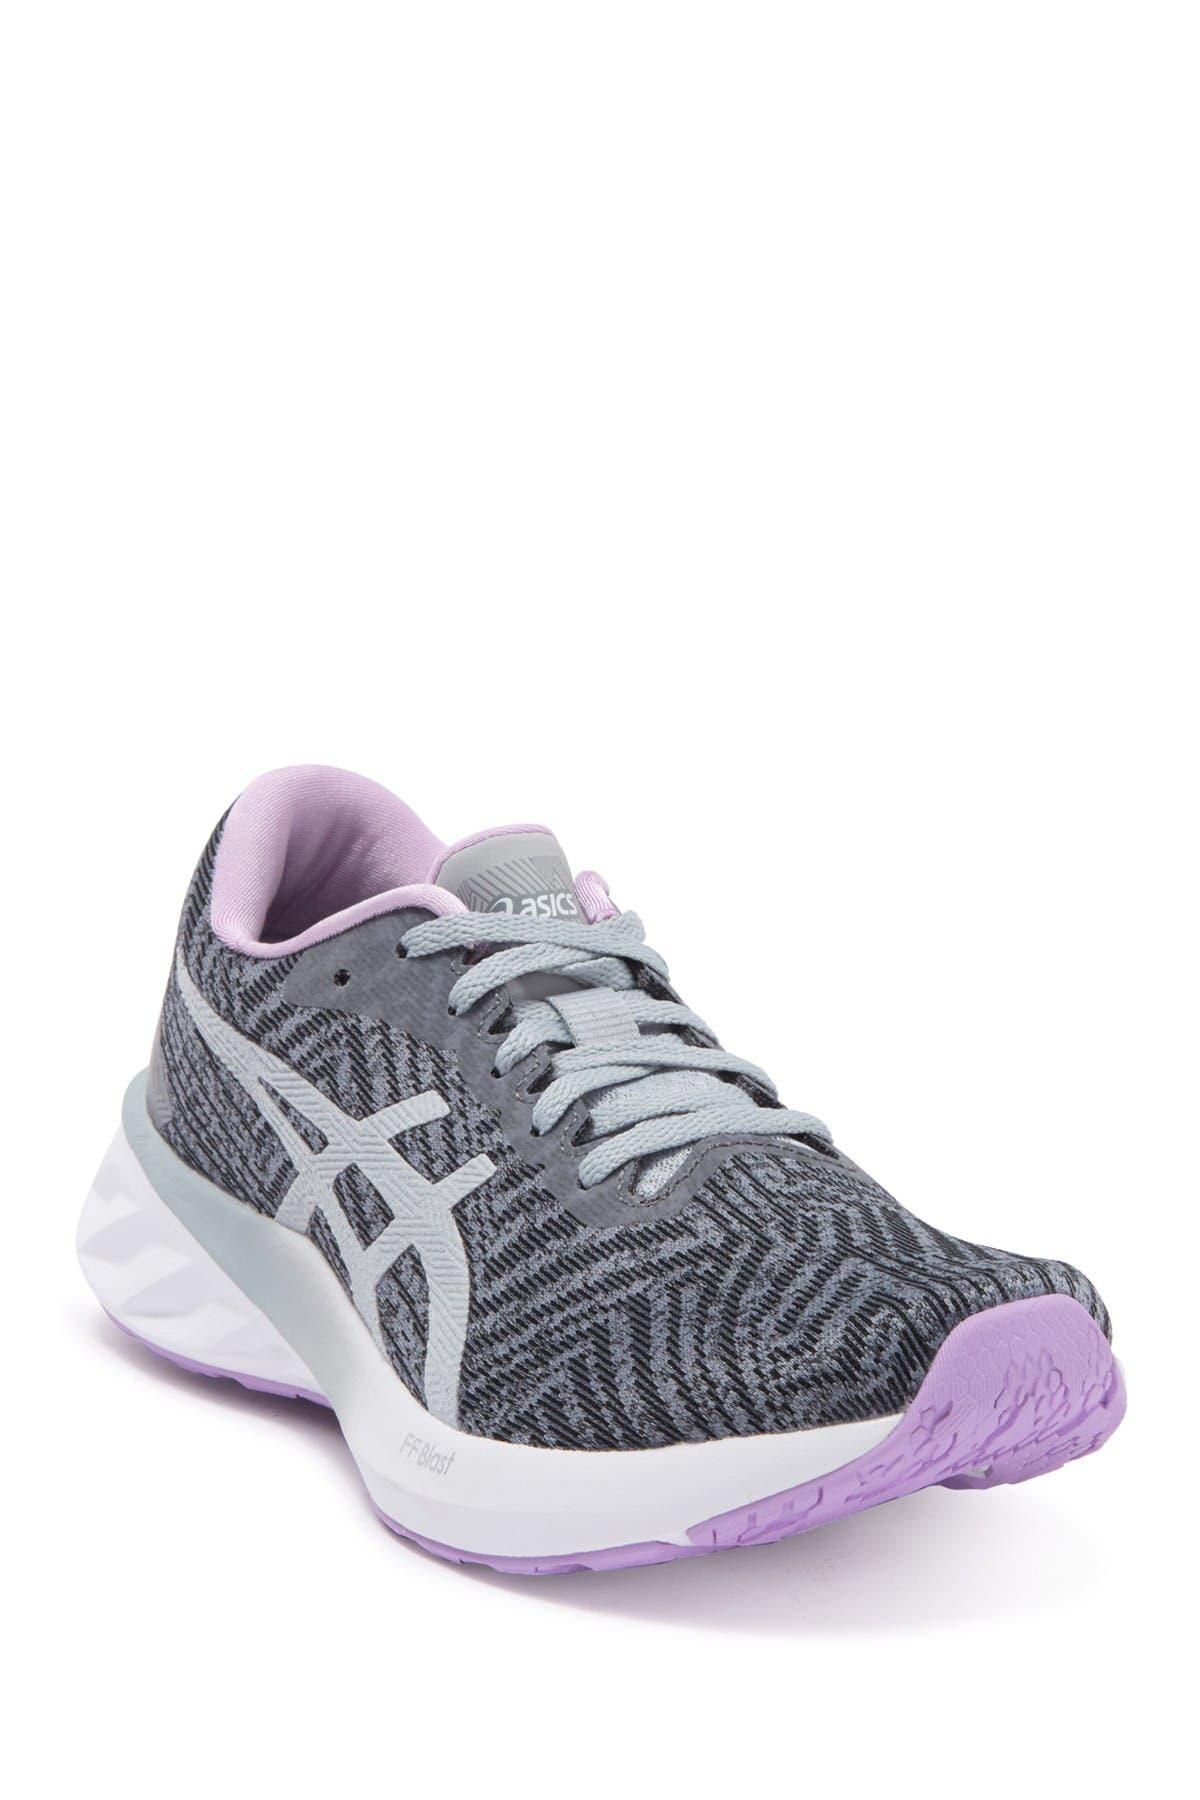 Image of ASICS Roadblast Sneaker